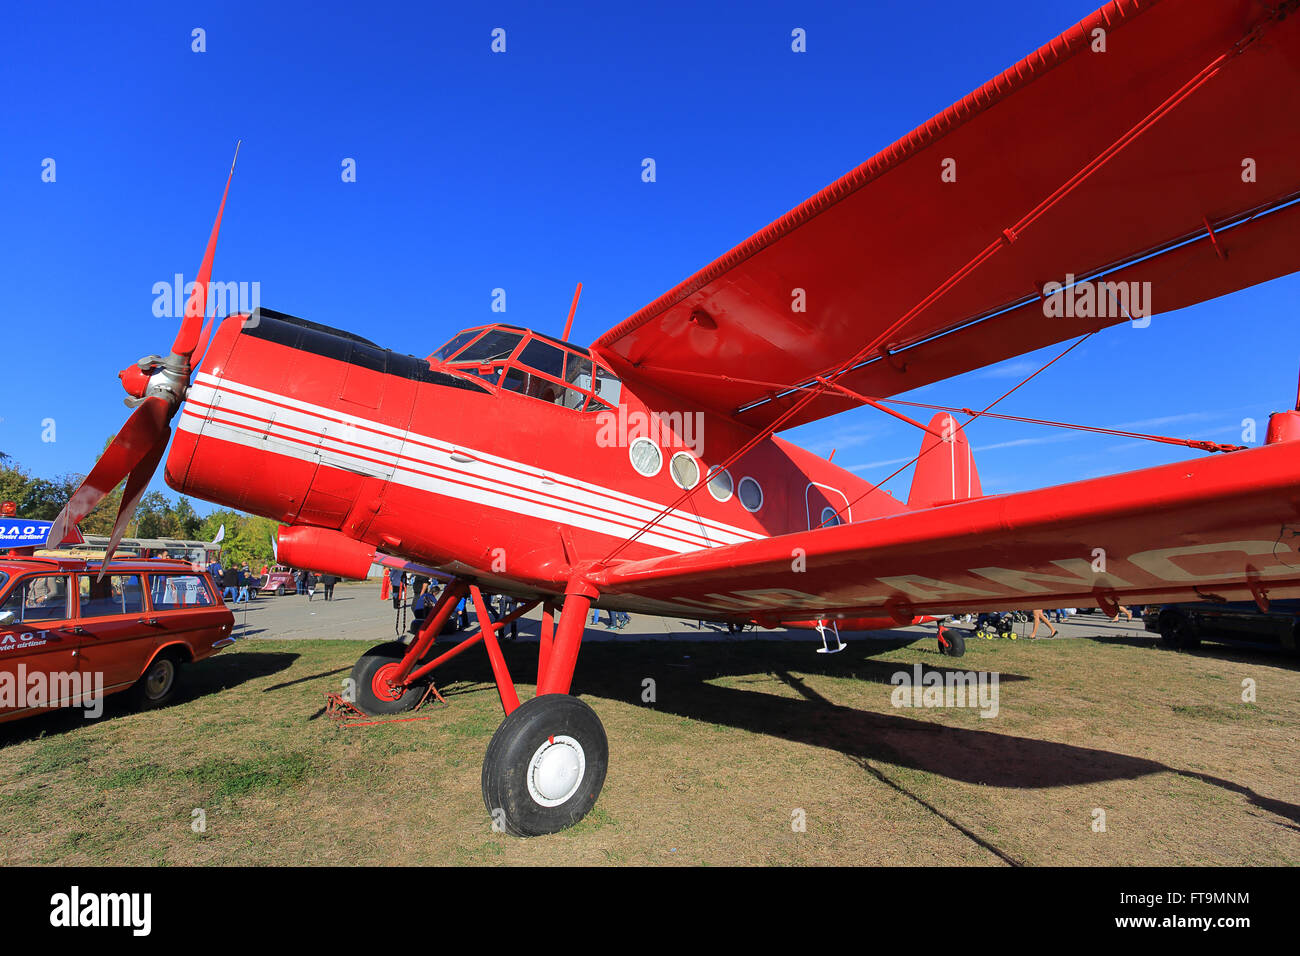 Biplane Antonov An-2 - Stock Image